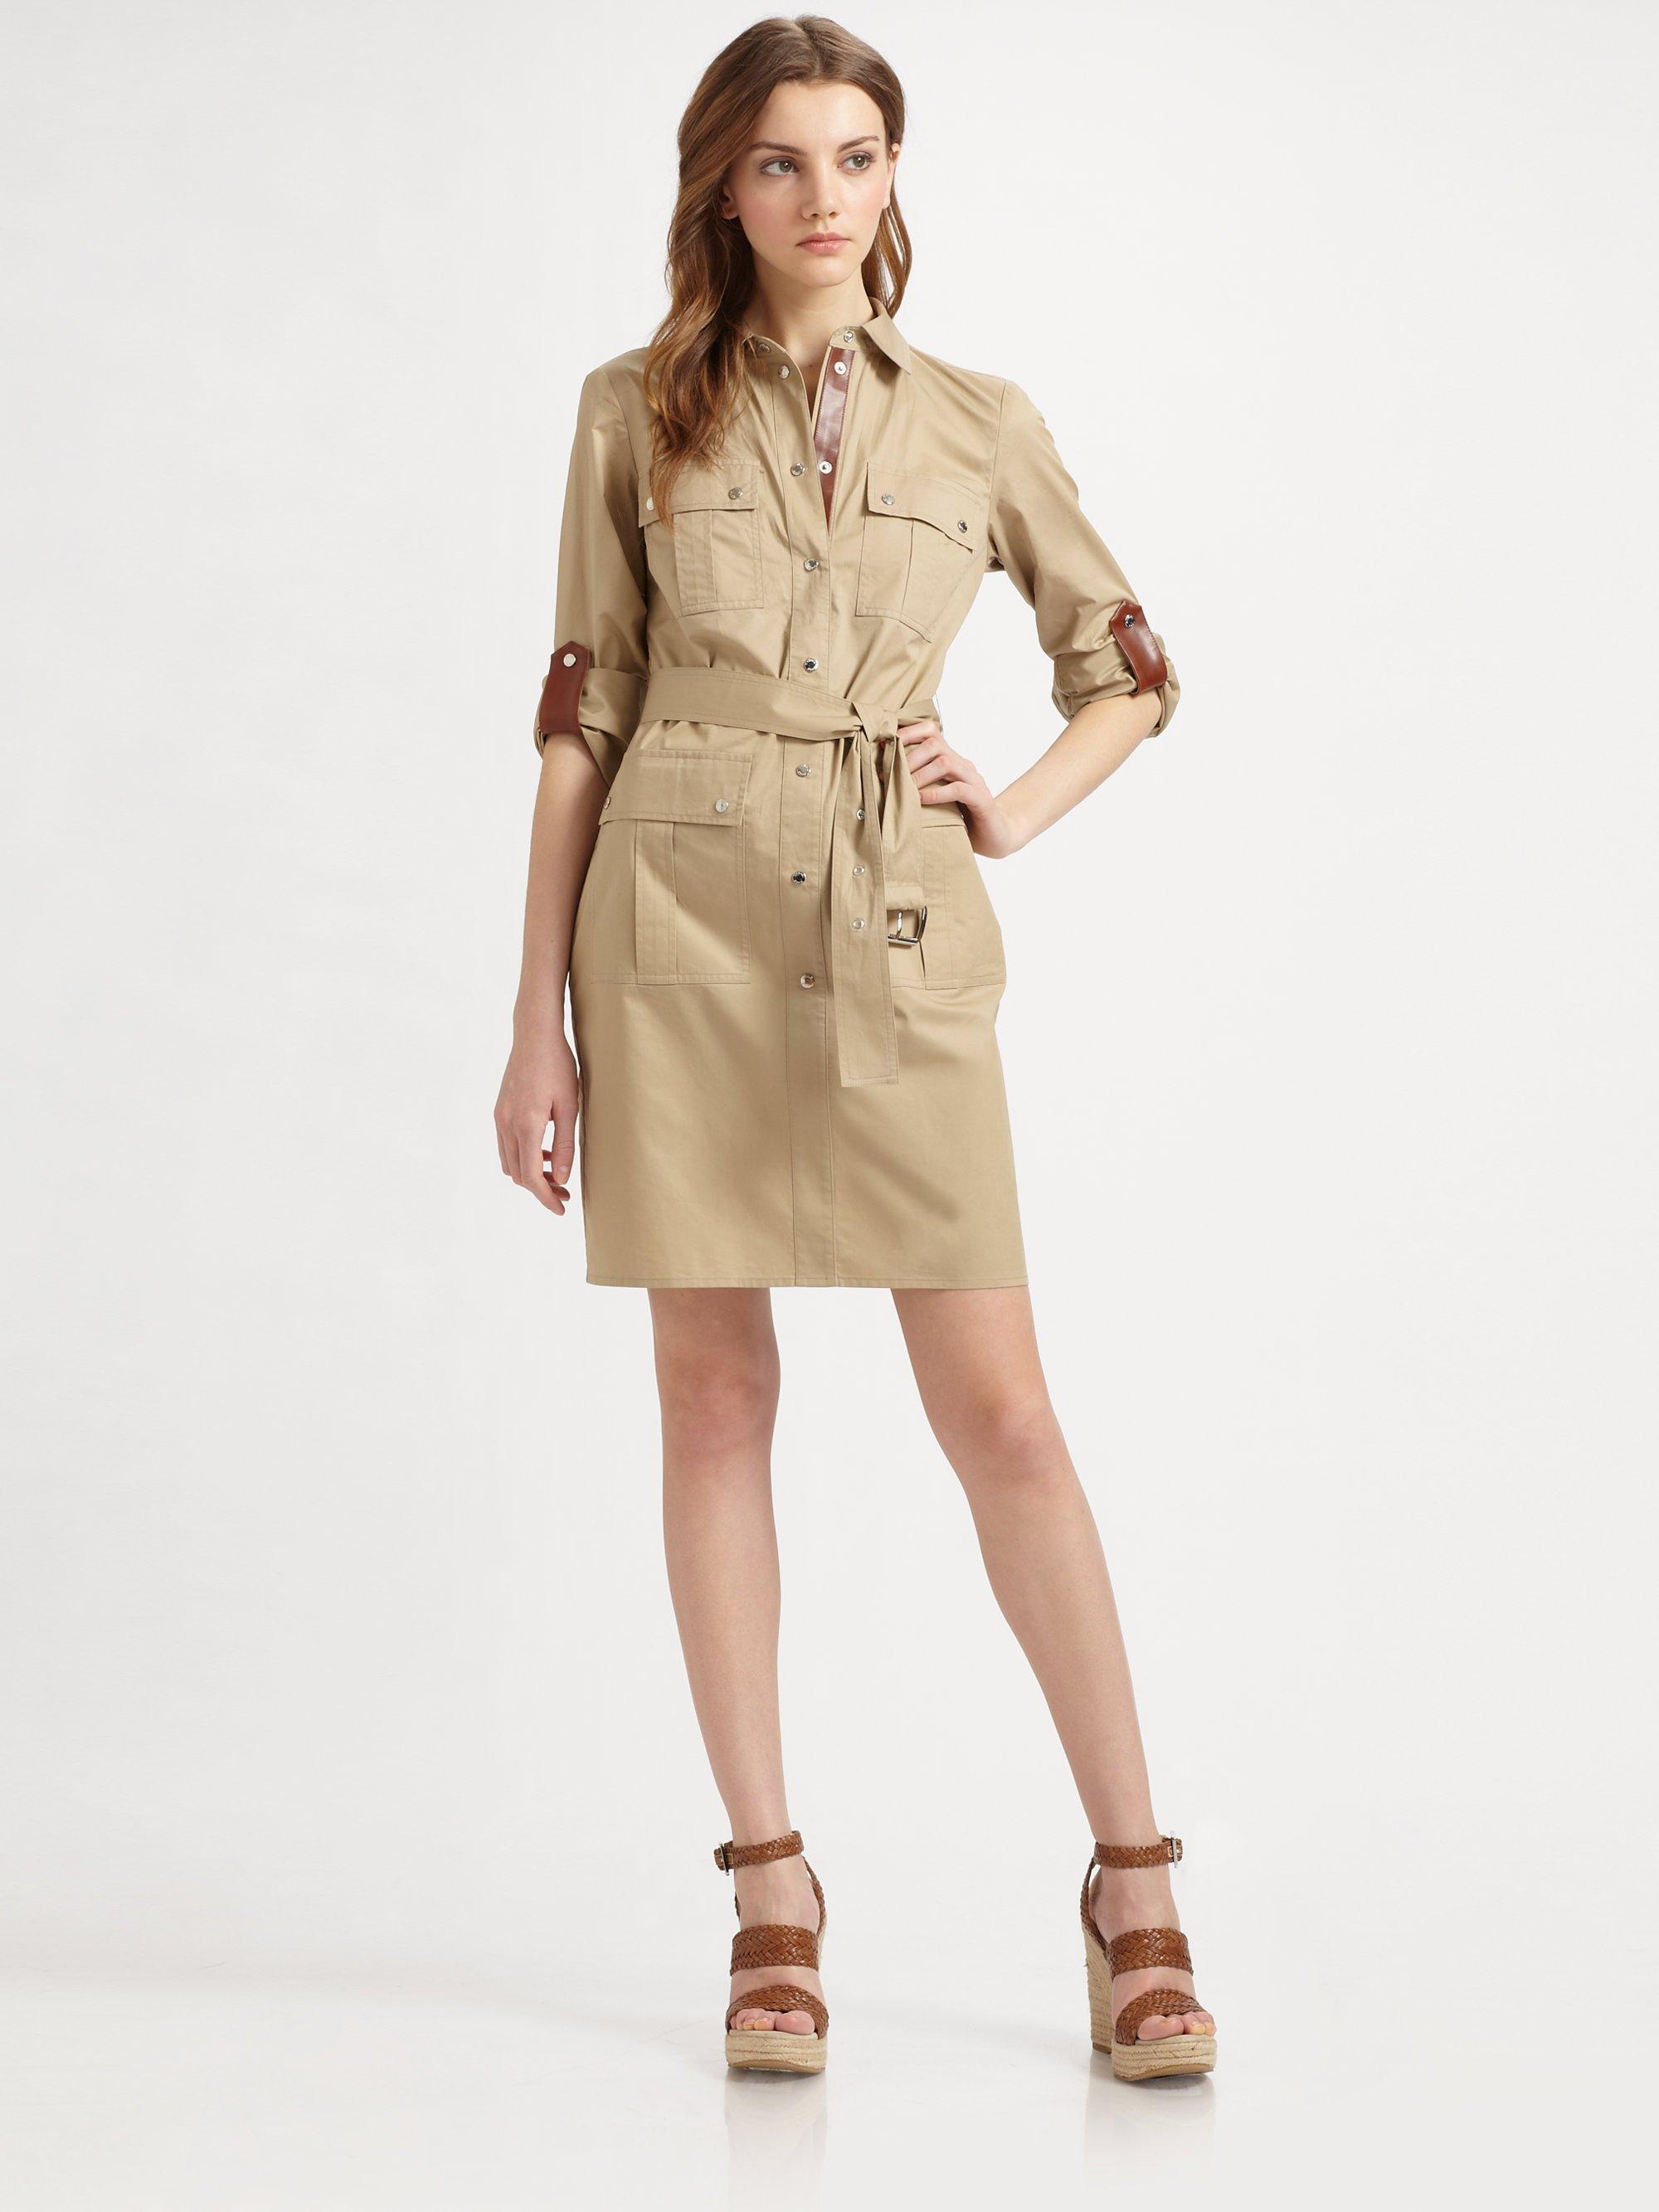 Michael Kors Safari Shirt Dress